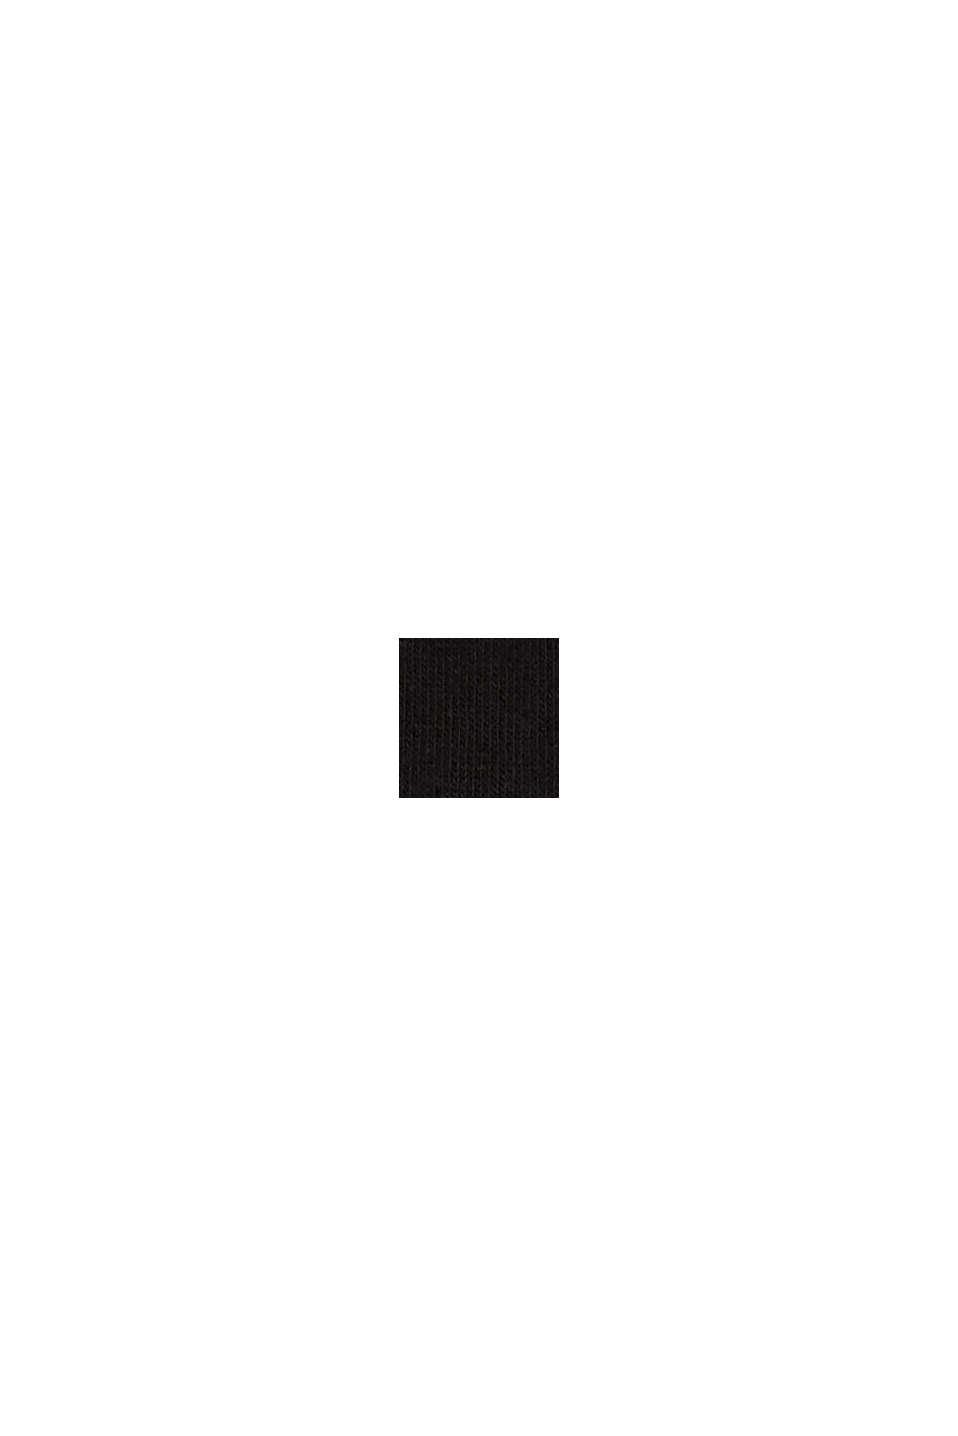 Calze melangiate in confezione doppia, BLACK, swatch